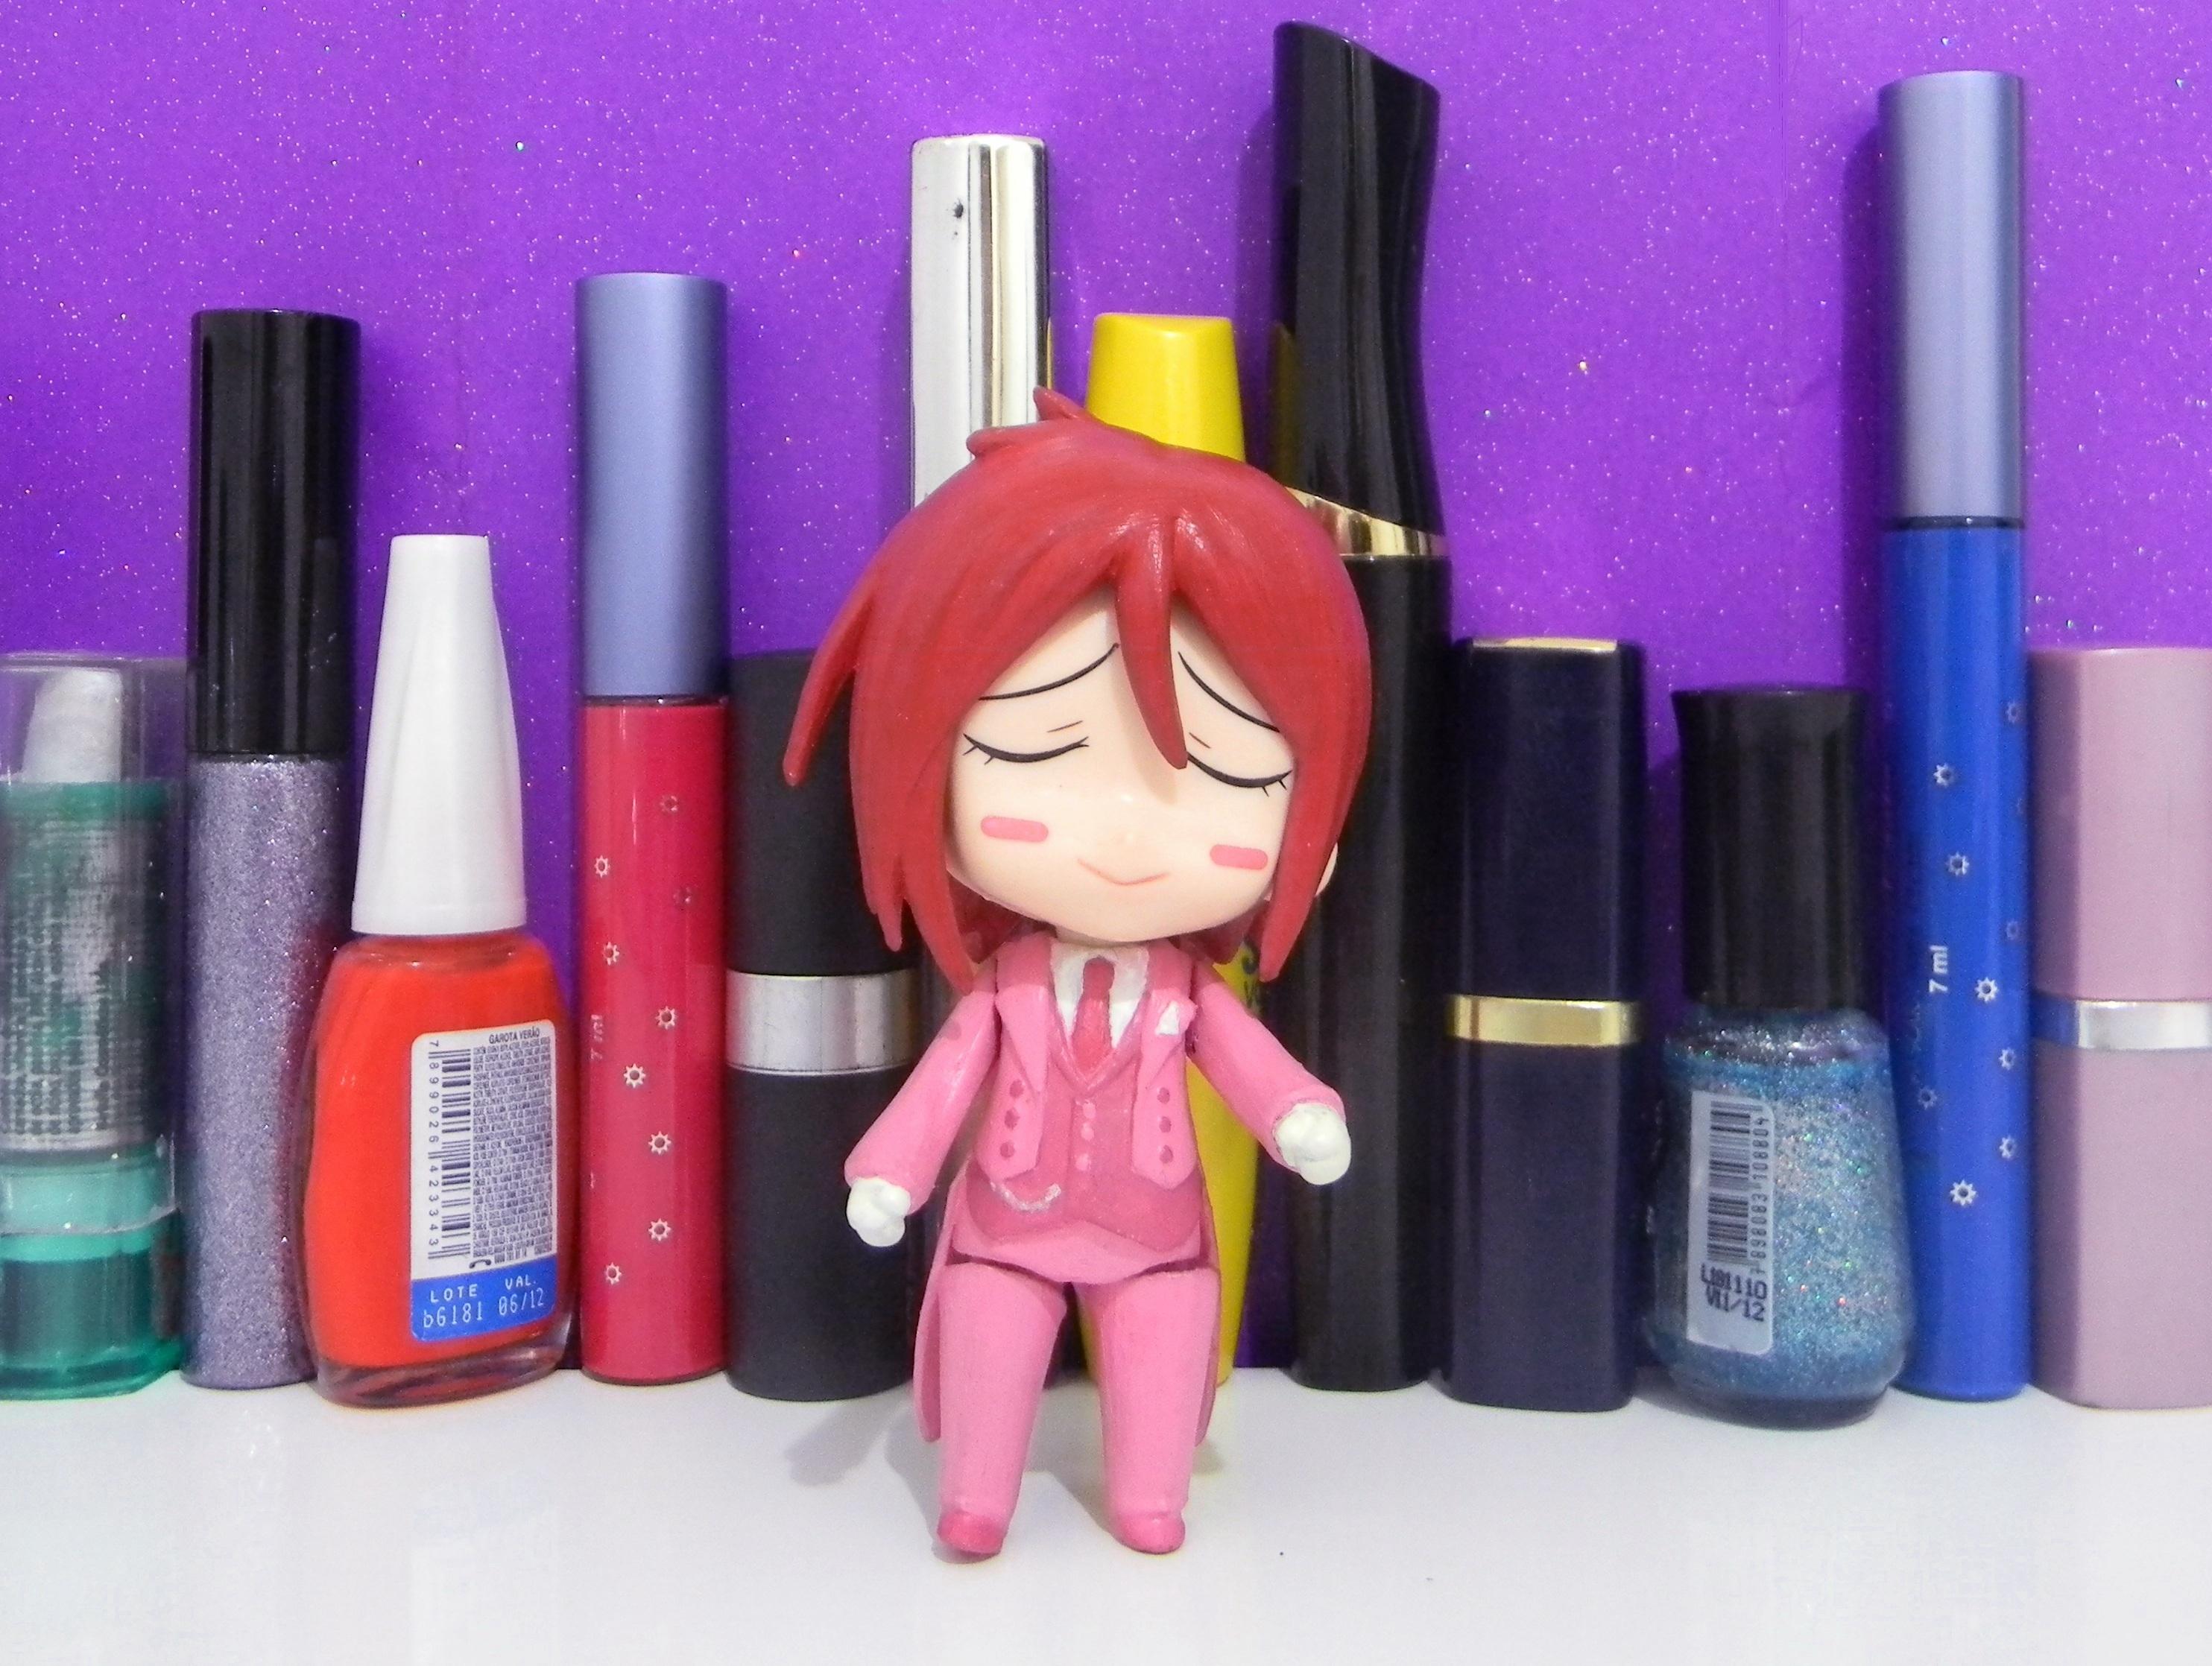 butler pink lipstick nendoroid red_hair kawaii custom nail_polish girls good_smile_company kuroshitsuji eyelashes bishounen tuxedo sebastian_michaelis nendoron maruhige